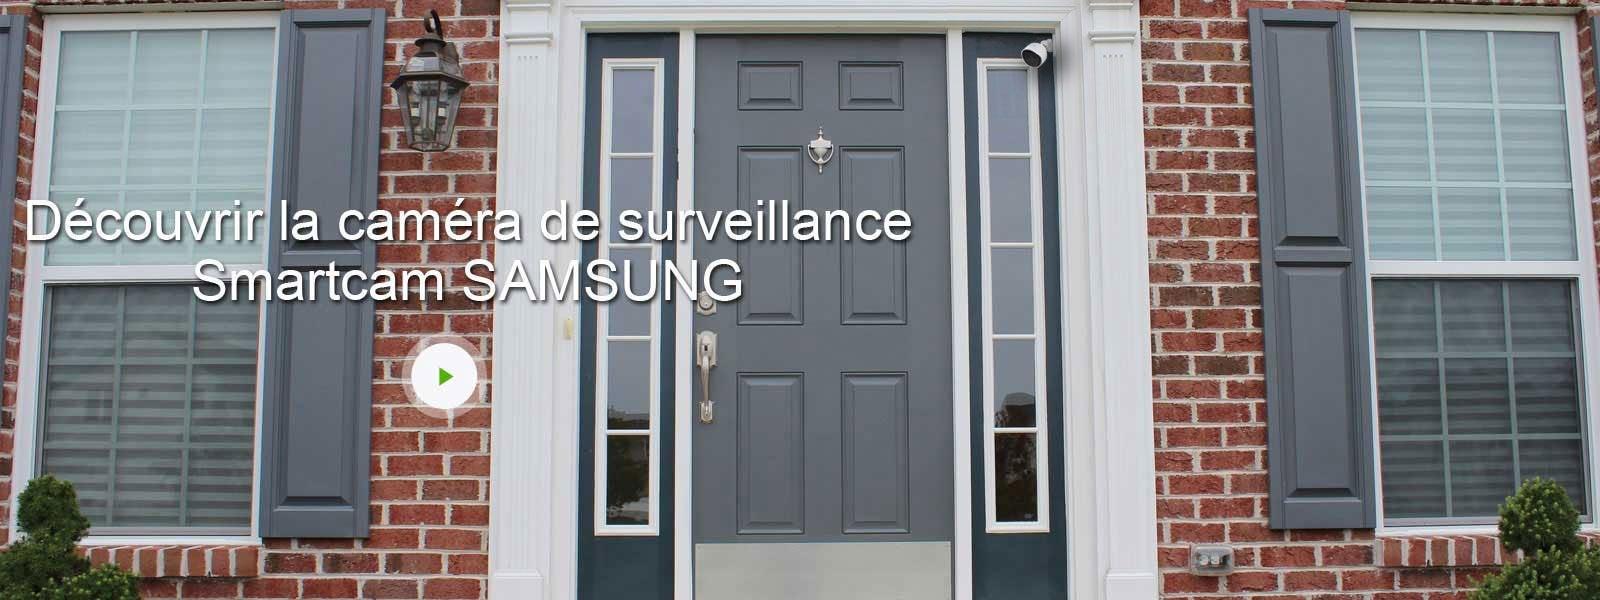 Fh Logo Samsung Mobile: Caméra Connectée Smartcam Full Hd SAMSUNG